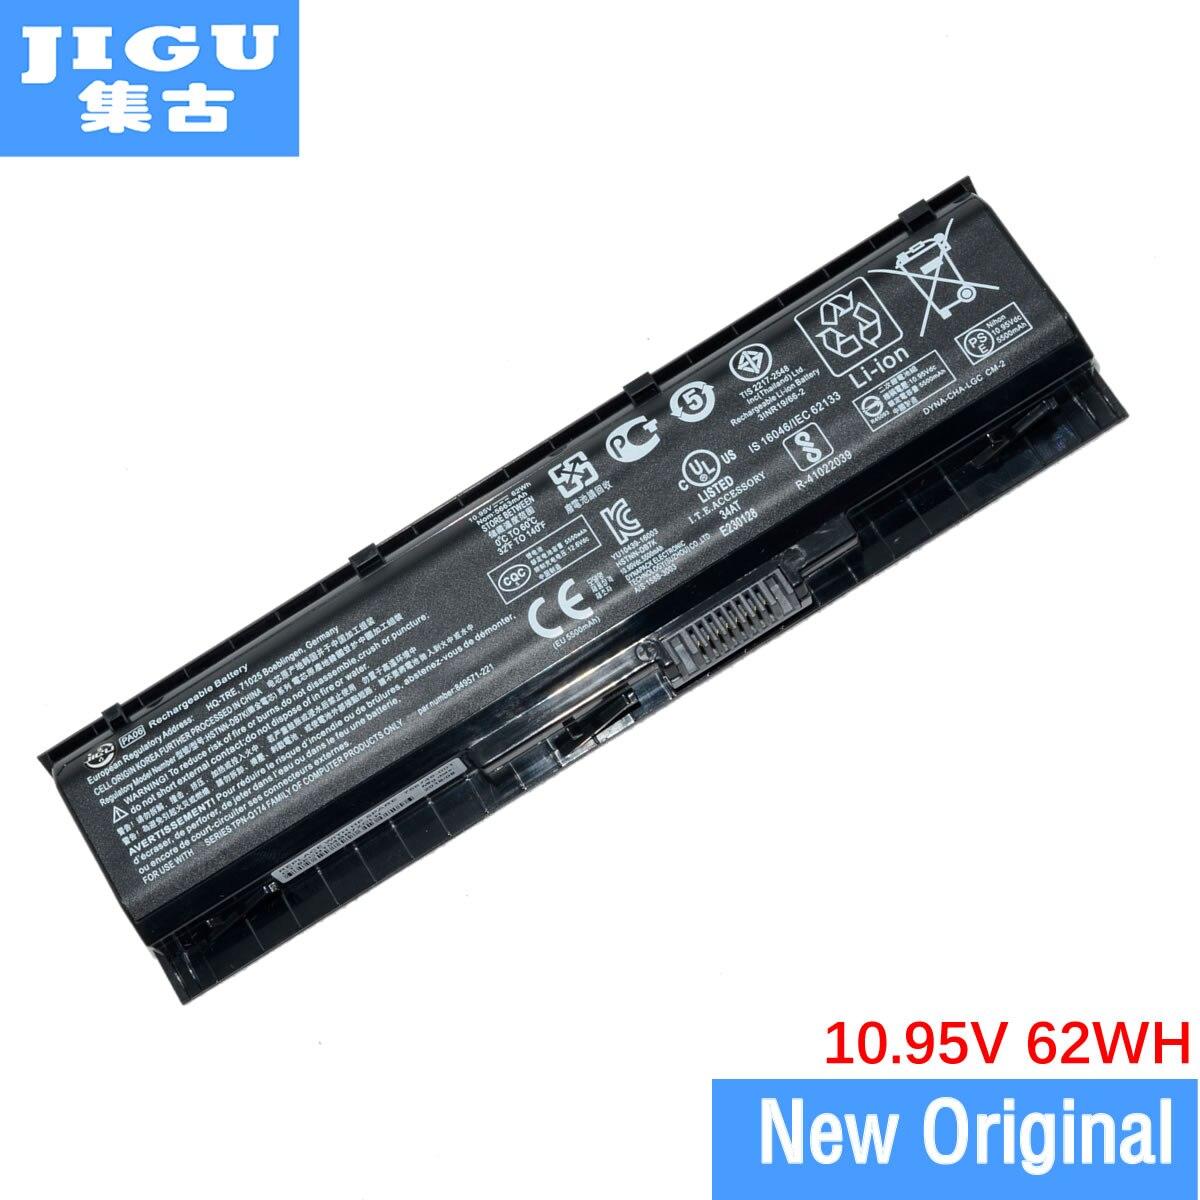 JIGU 10.95V 62WH 849911-850 HSTNN-DB7K PA06 PA06062 الأصلي جديد بطارية كمبيوتر محمول لإتش بي جناح 17 17-ab000 17t-ab000